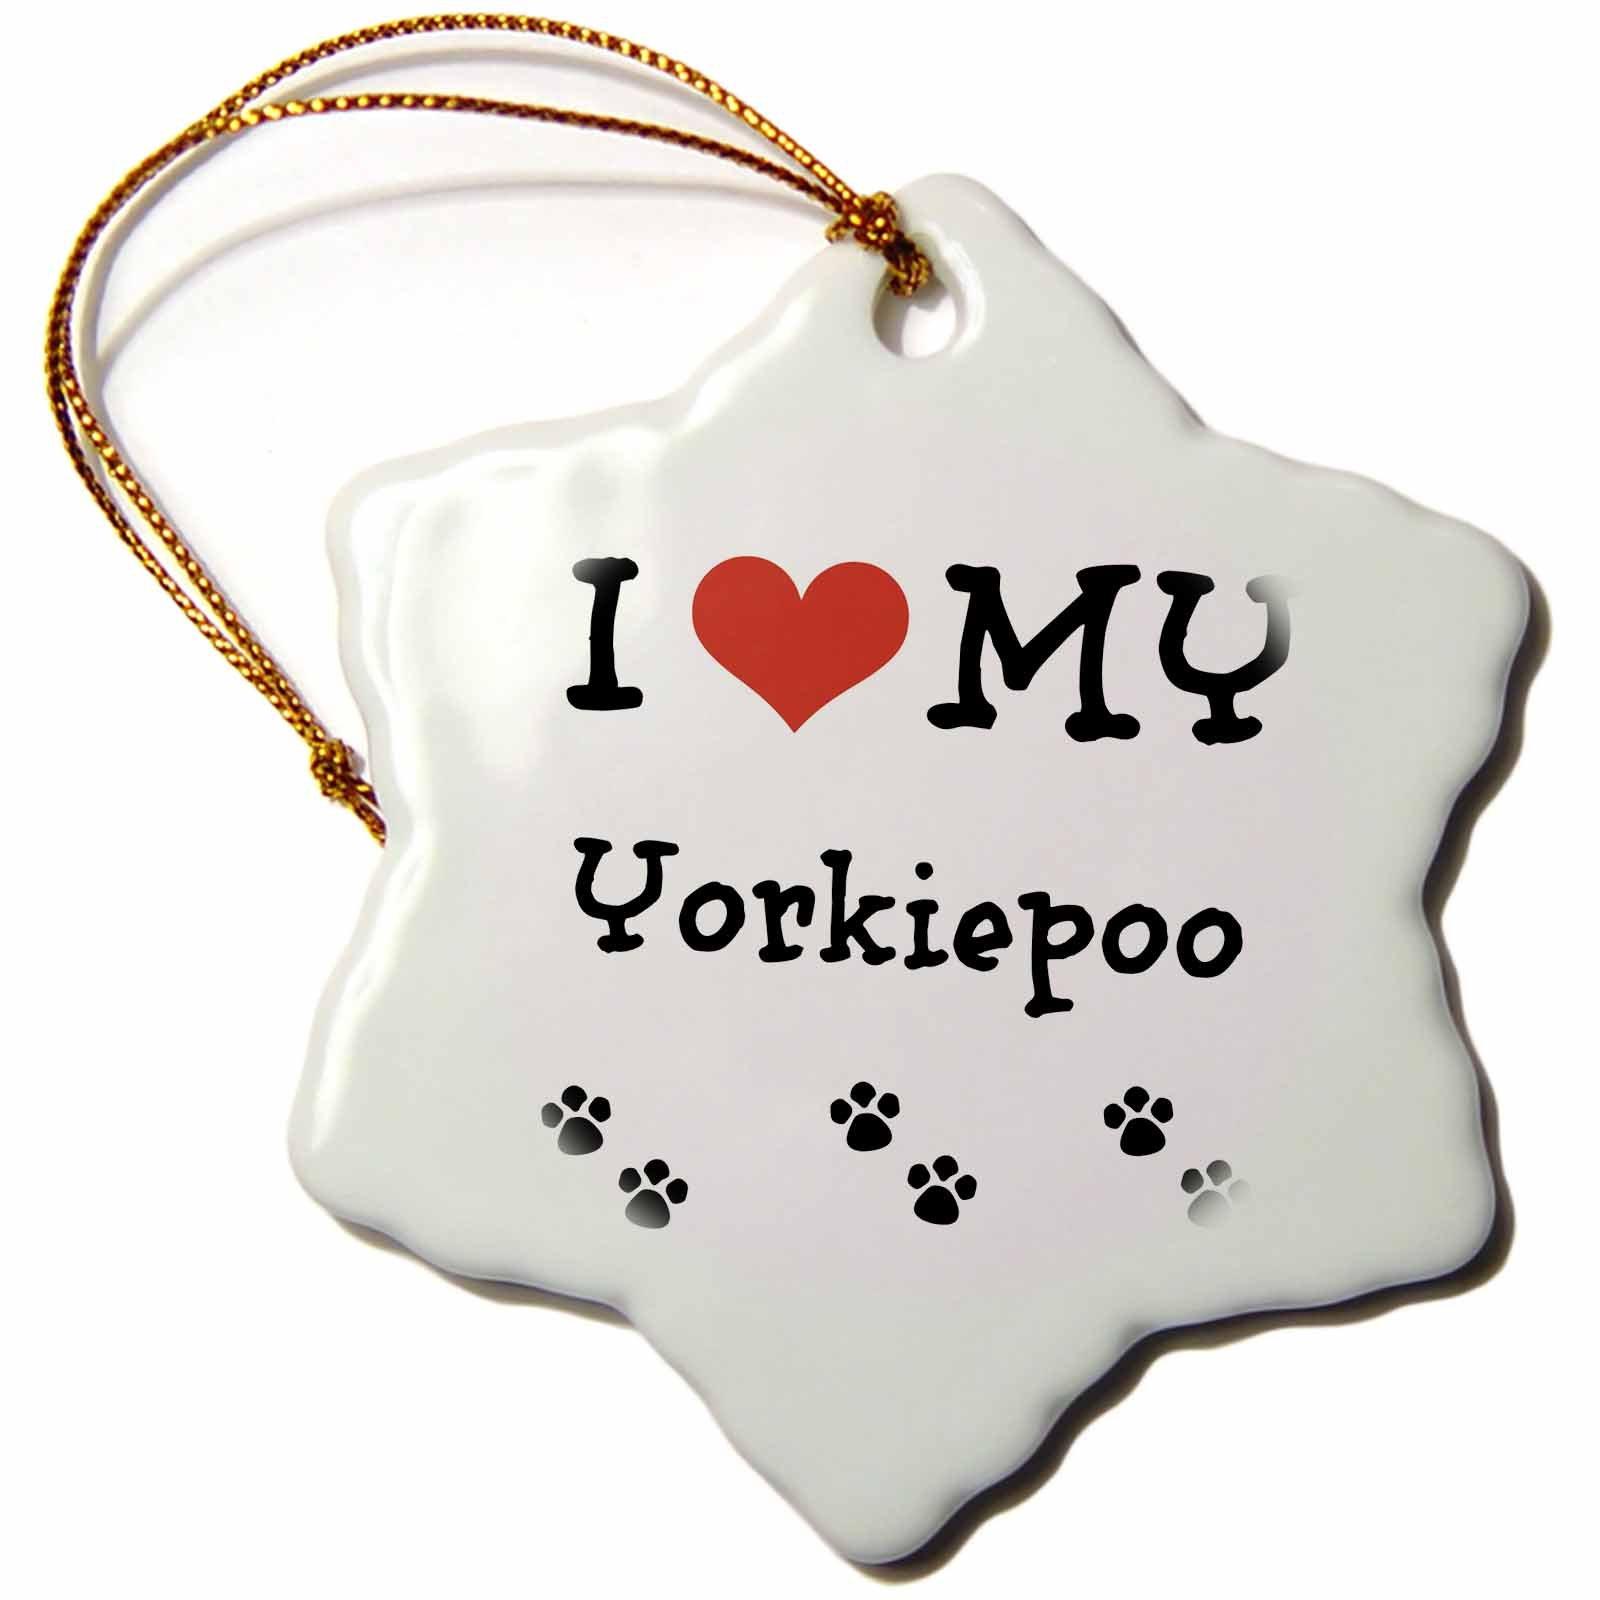 3dRose orn_183651_1 I Love My Yorkiepoo Snowflake Ornament, Porcelain, 3-Inch